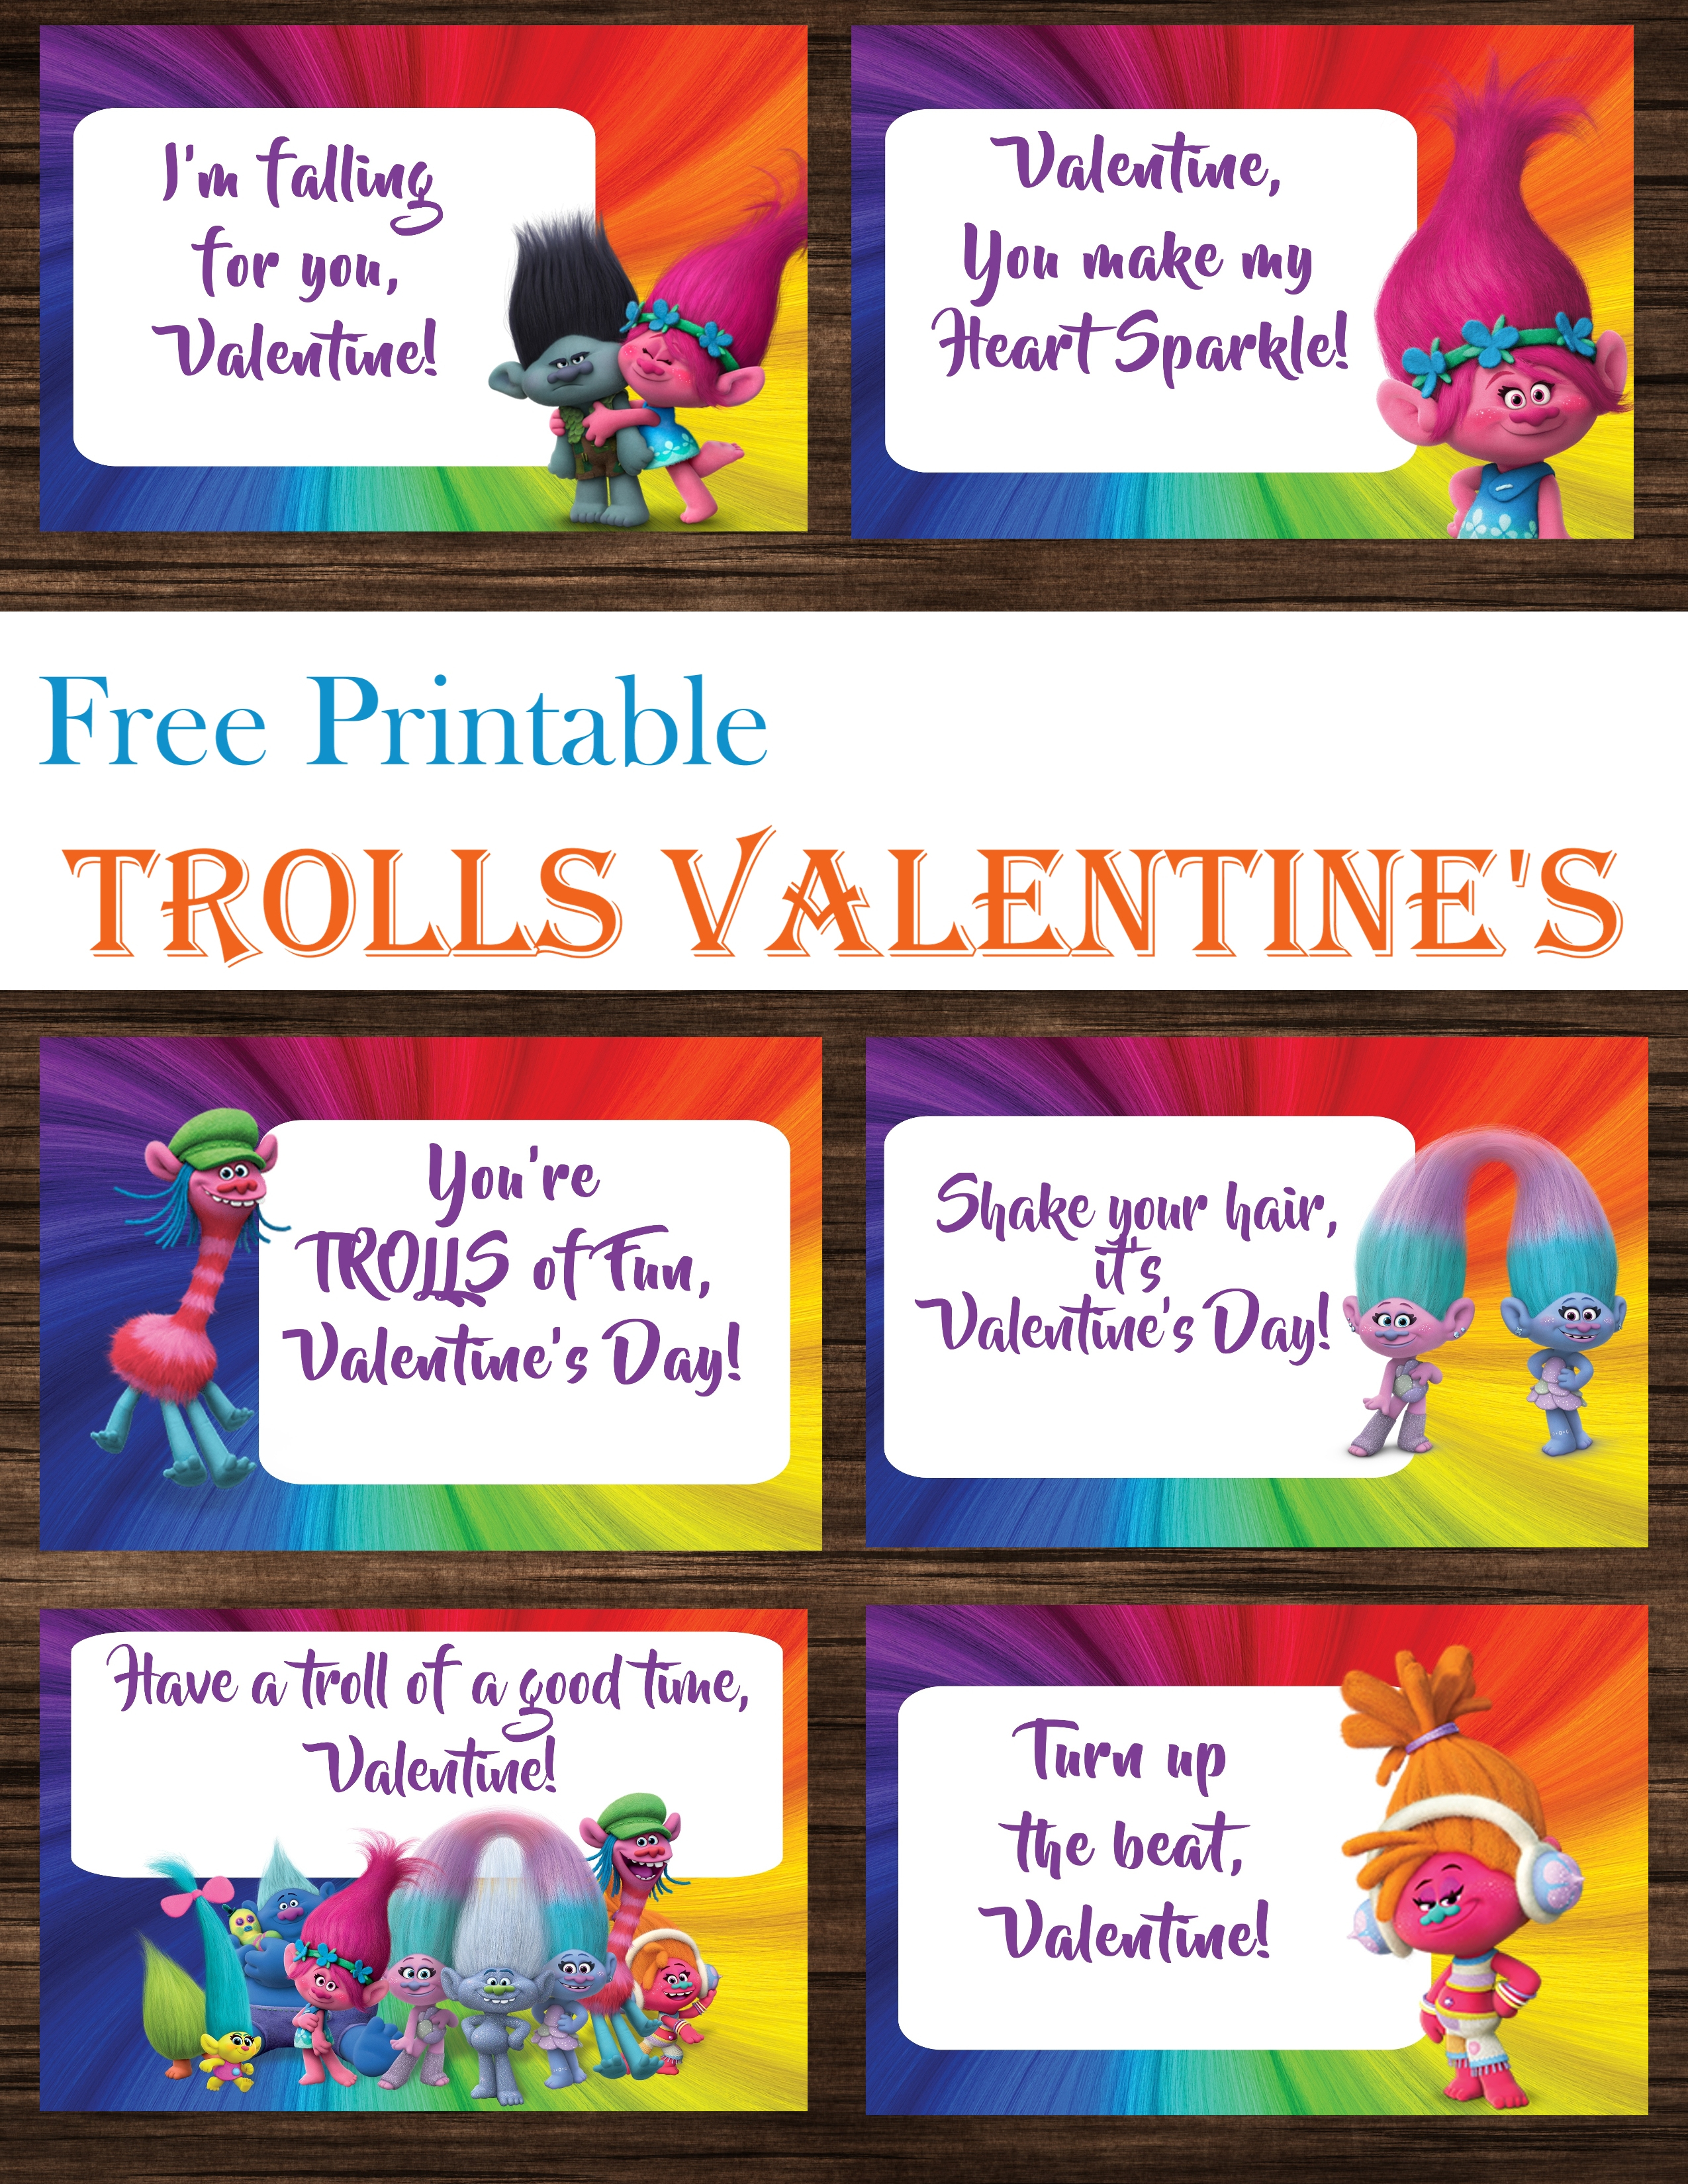 Trolls Valentine's Day Cards Free Printables - Printables 4 Mom - Free Printable Trolls